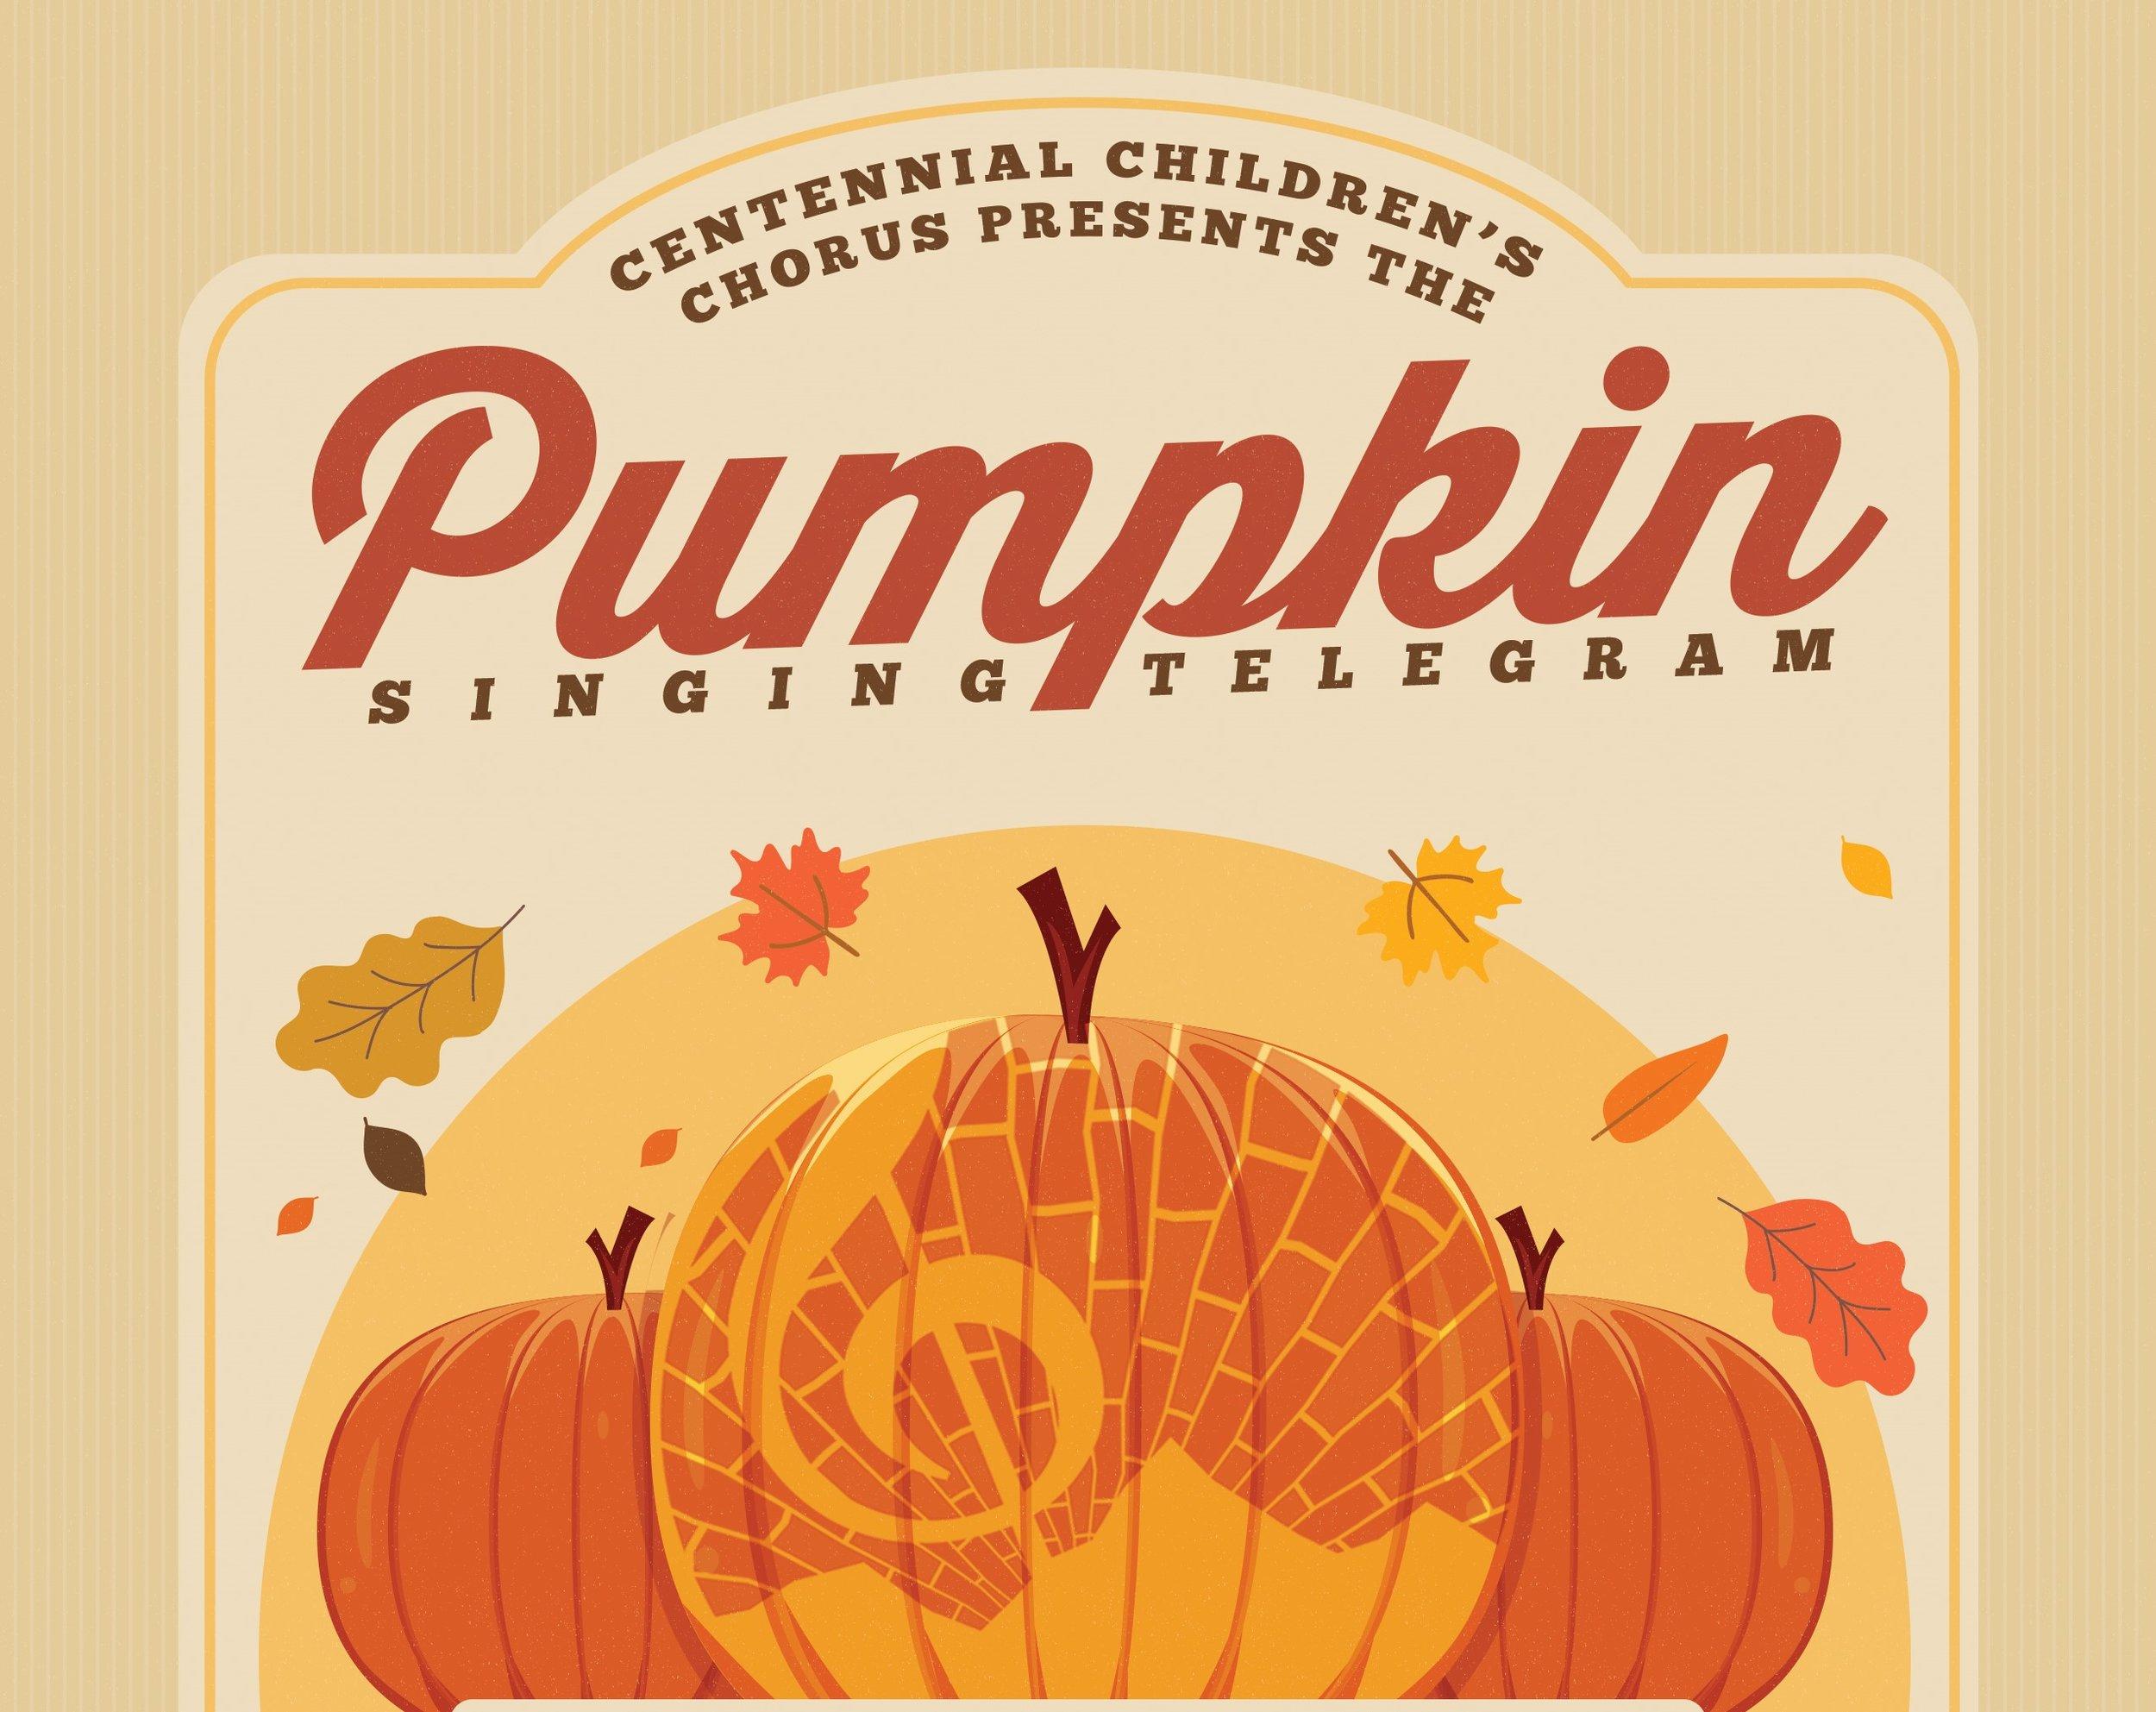 CCC_PumpkinSingingTelegram_Flyer.jpg